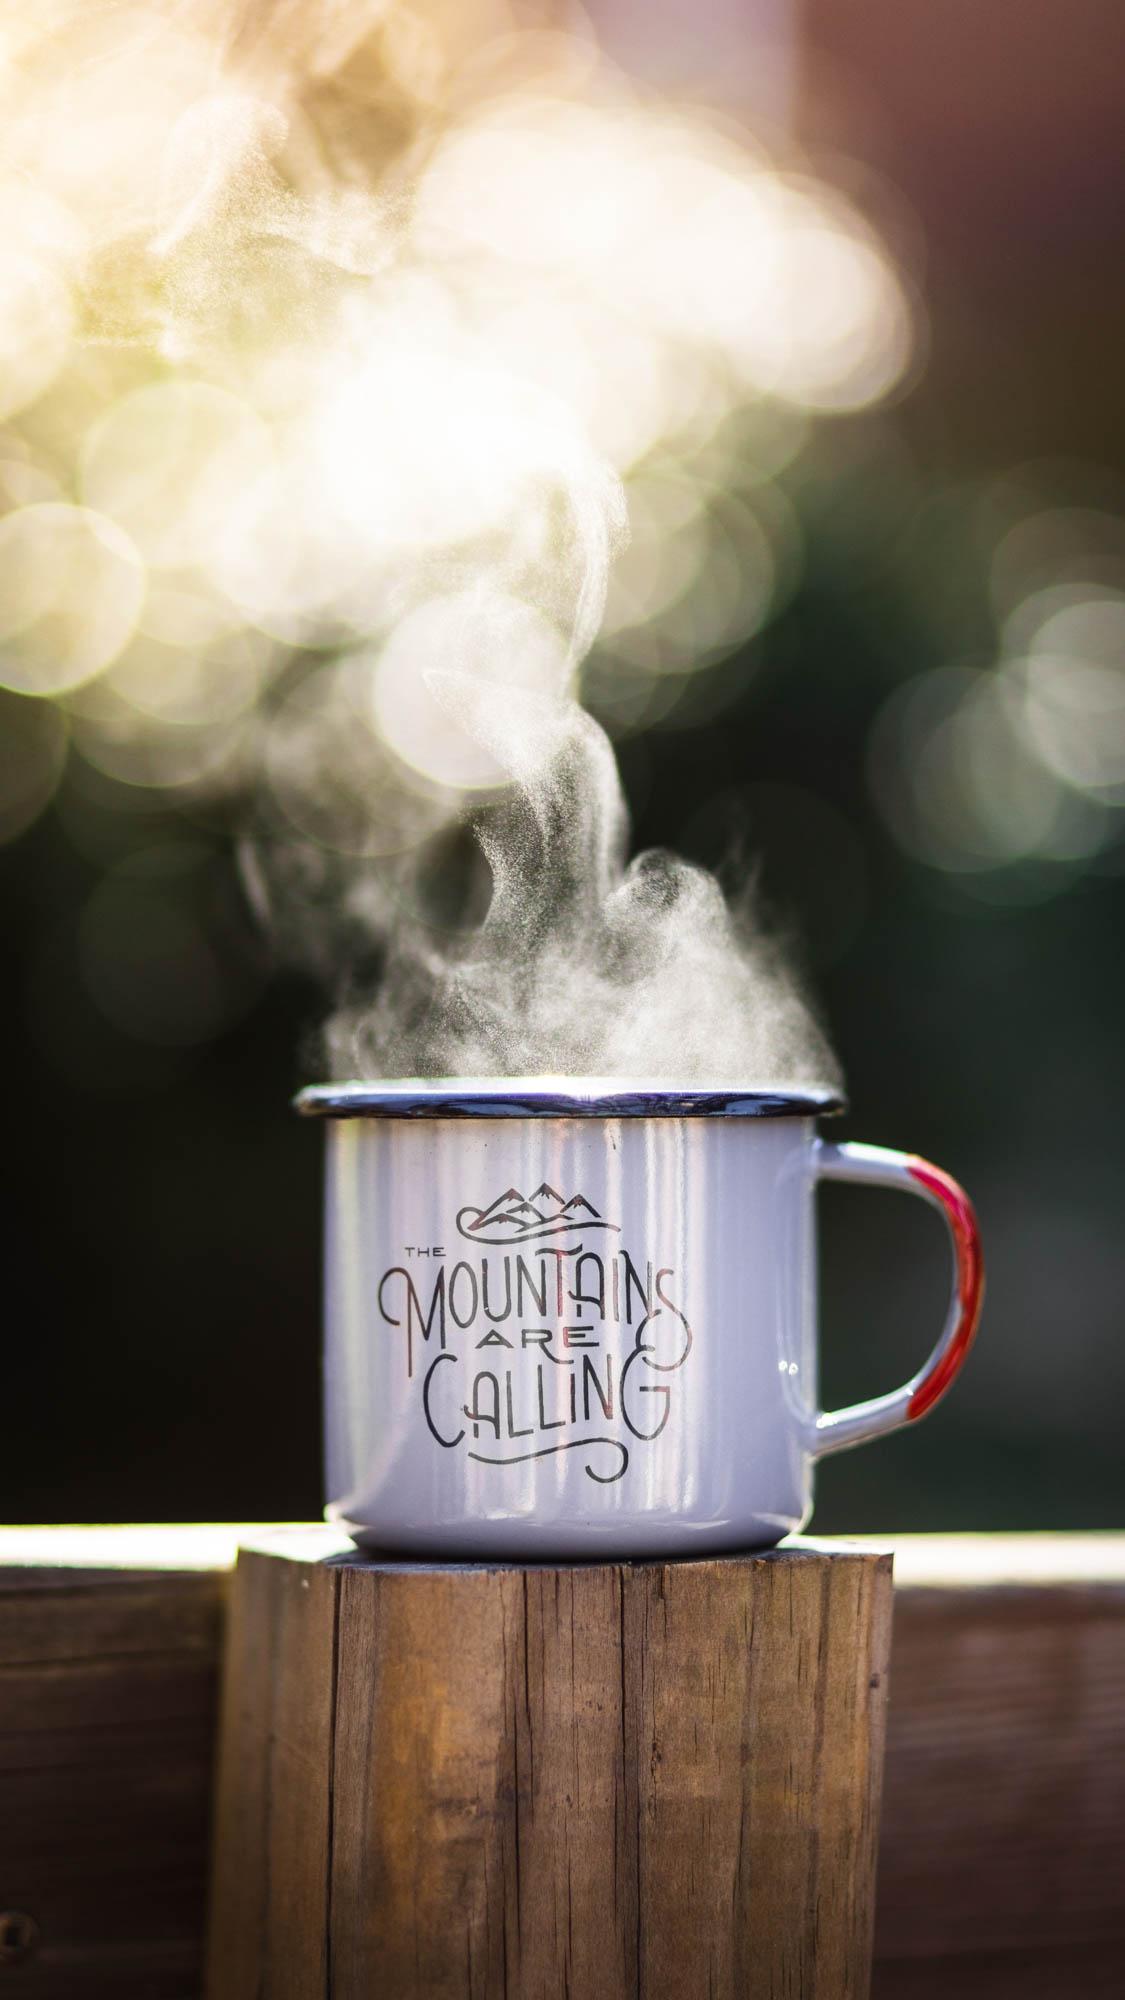 Cold Coffee Cup.jpg